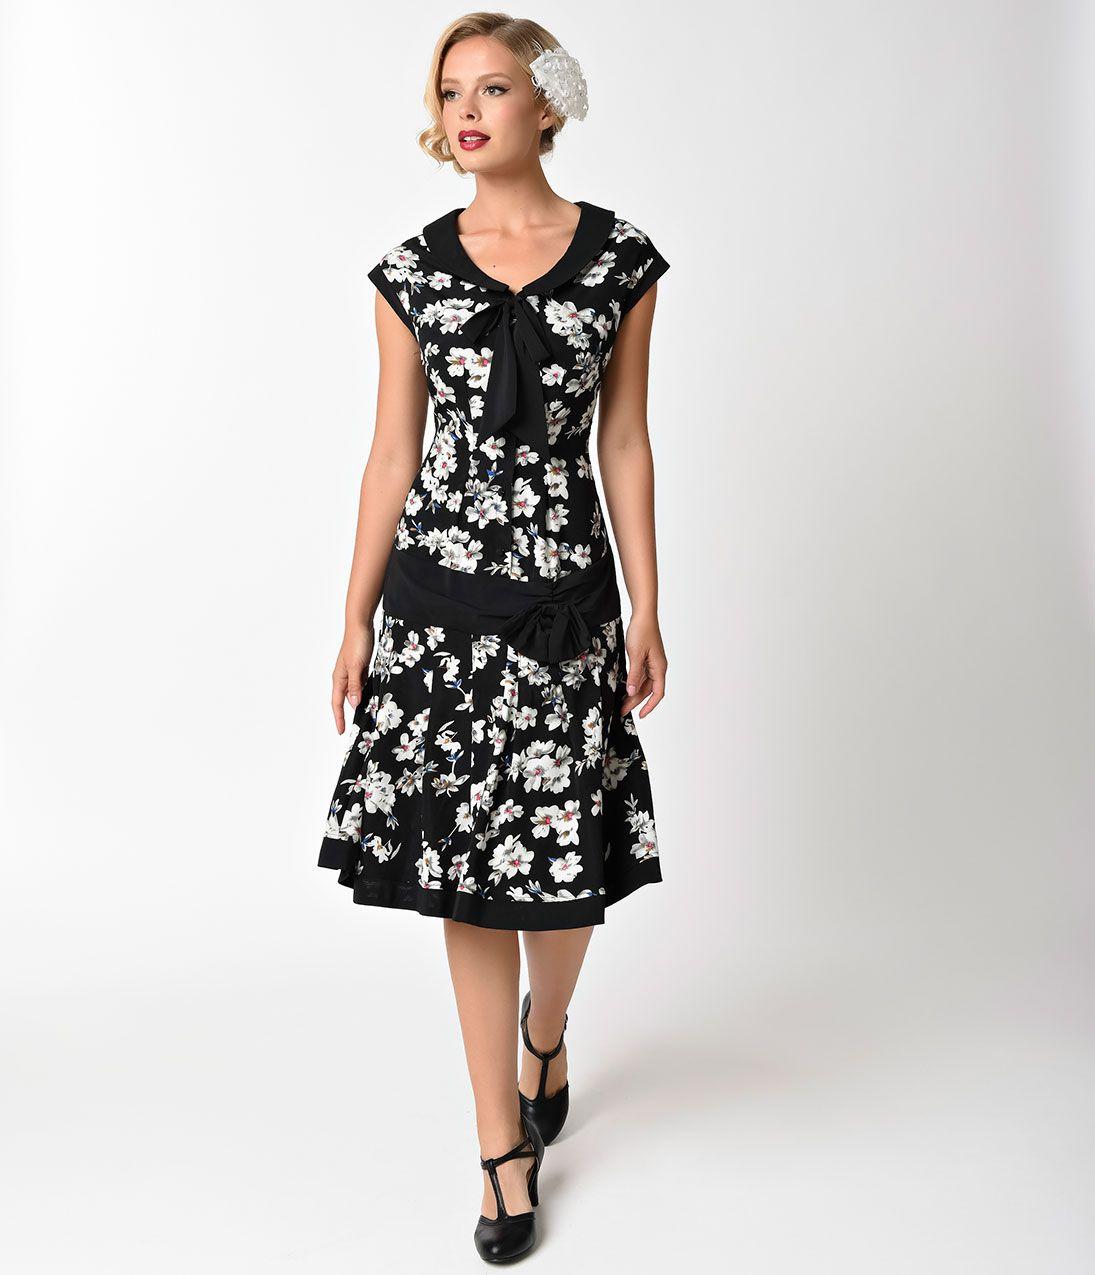 1920s Style Dresses Unique Vintage 1930s Style Black Ivory Floral Twyla Flapper Day Dress 110 00 At Vi 1920s Fashion Dresses 1920s Fashion Casual Day Dresses [ 1275 x 1095 Pixel ]